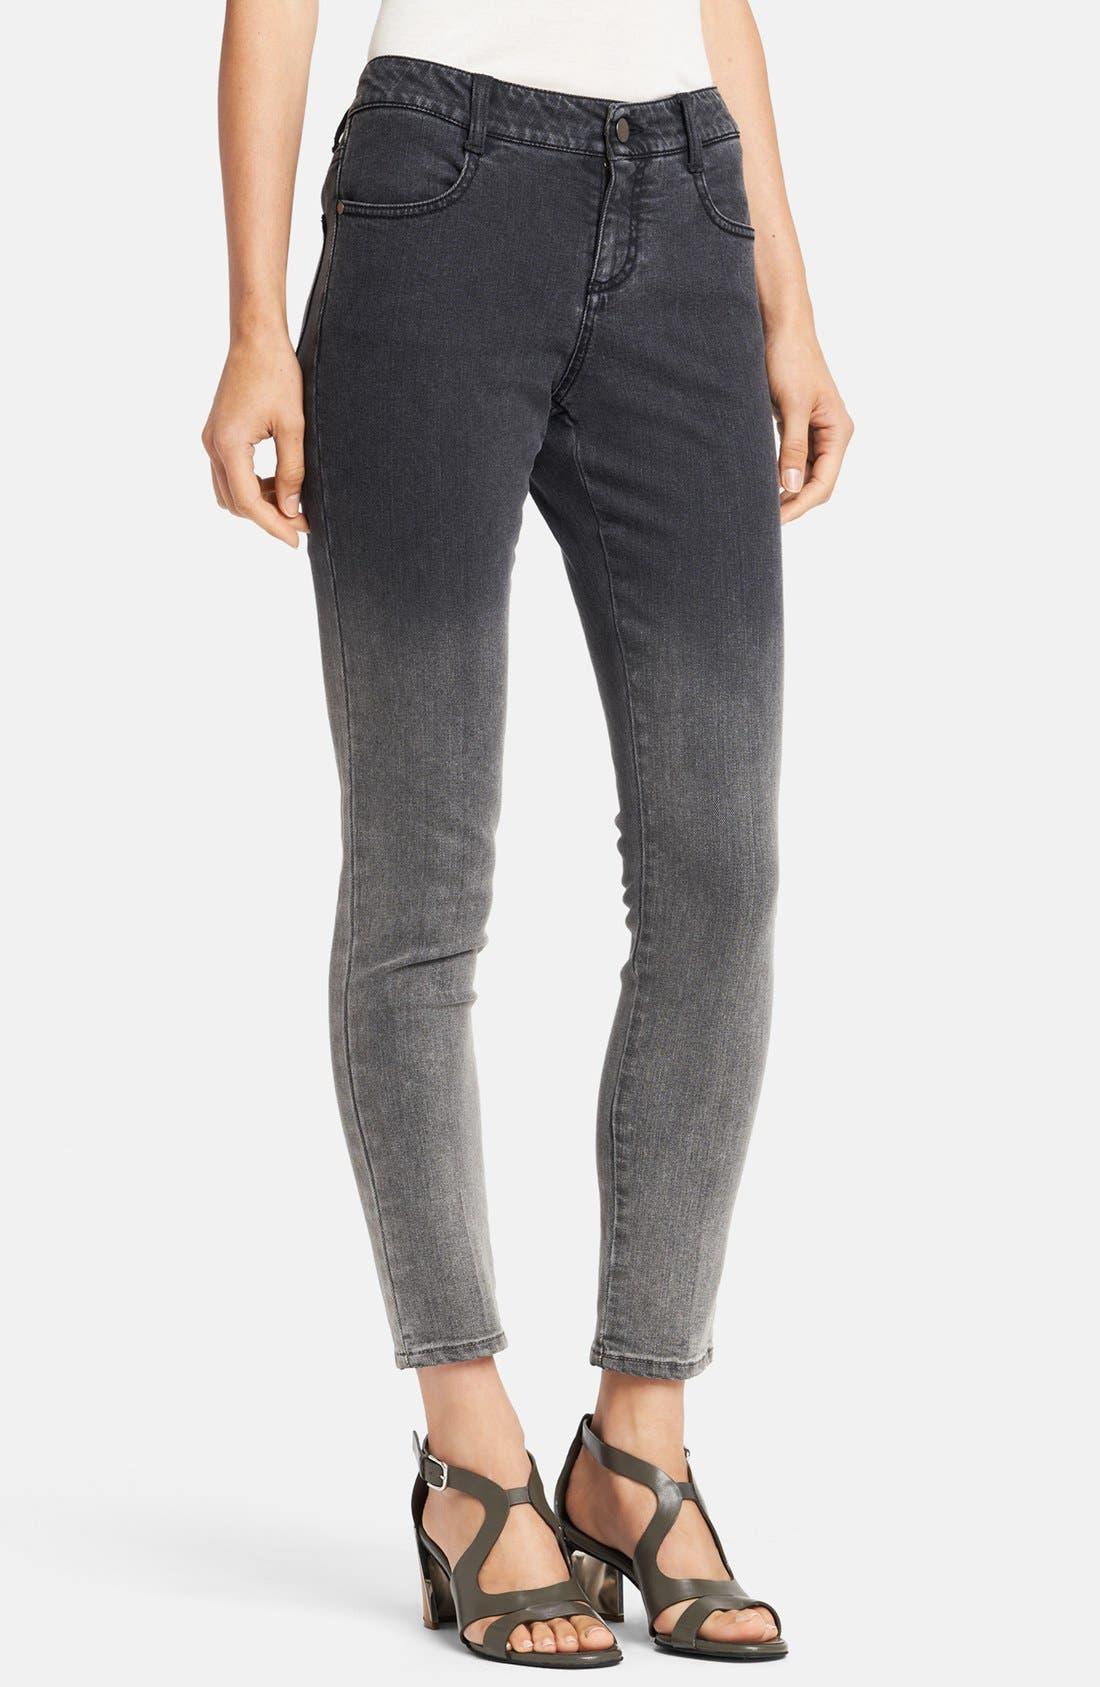 Main Image - Stella McCartney 'Simone' Dégradé Skinny Ankle Grazer Jeans